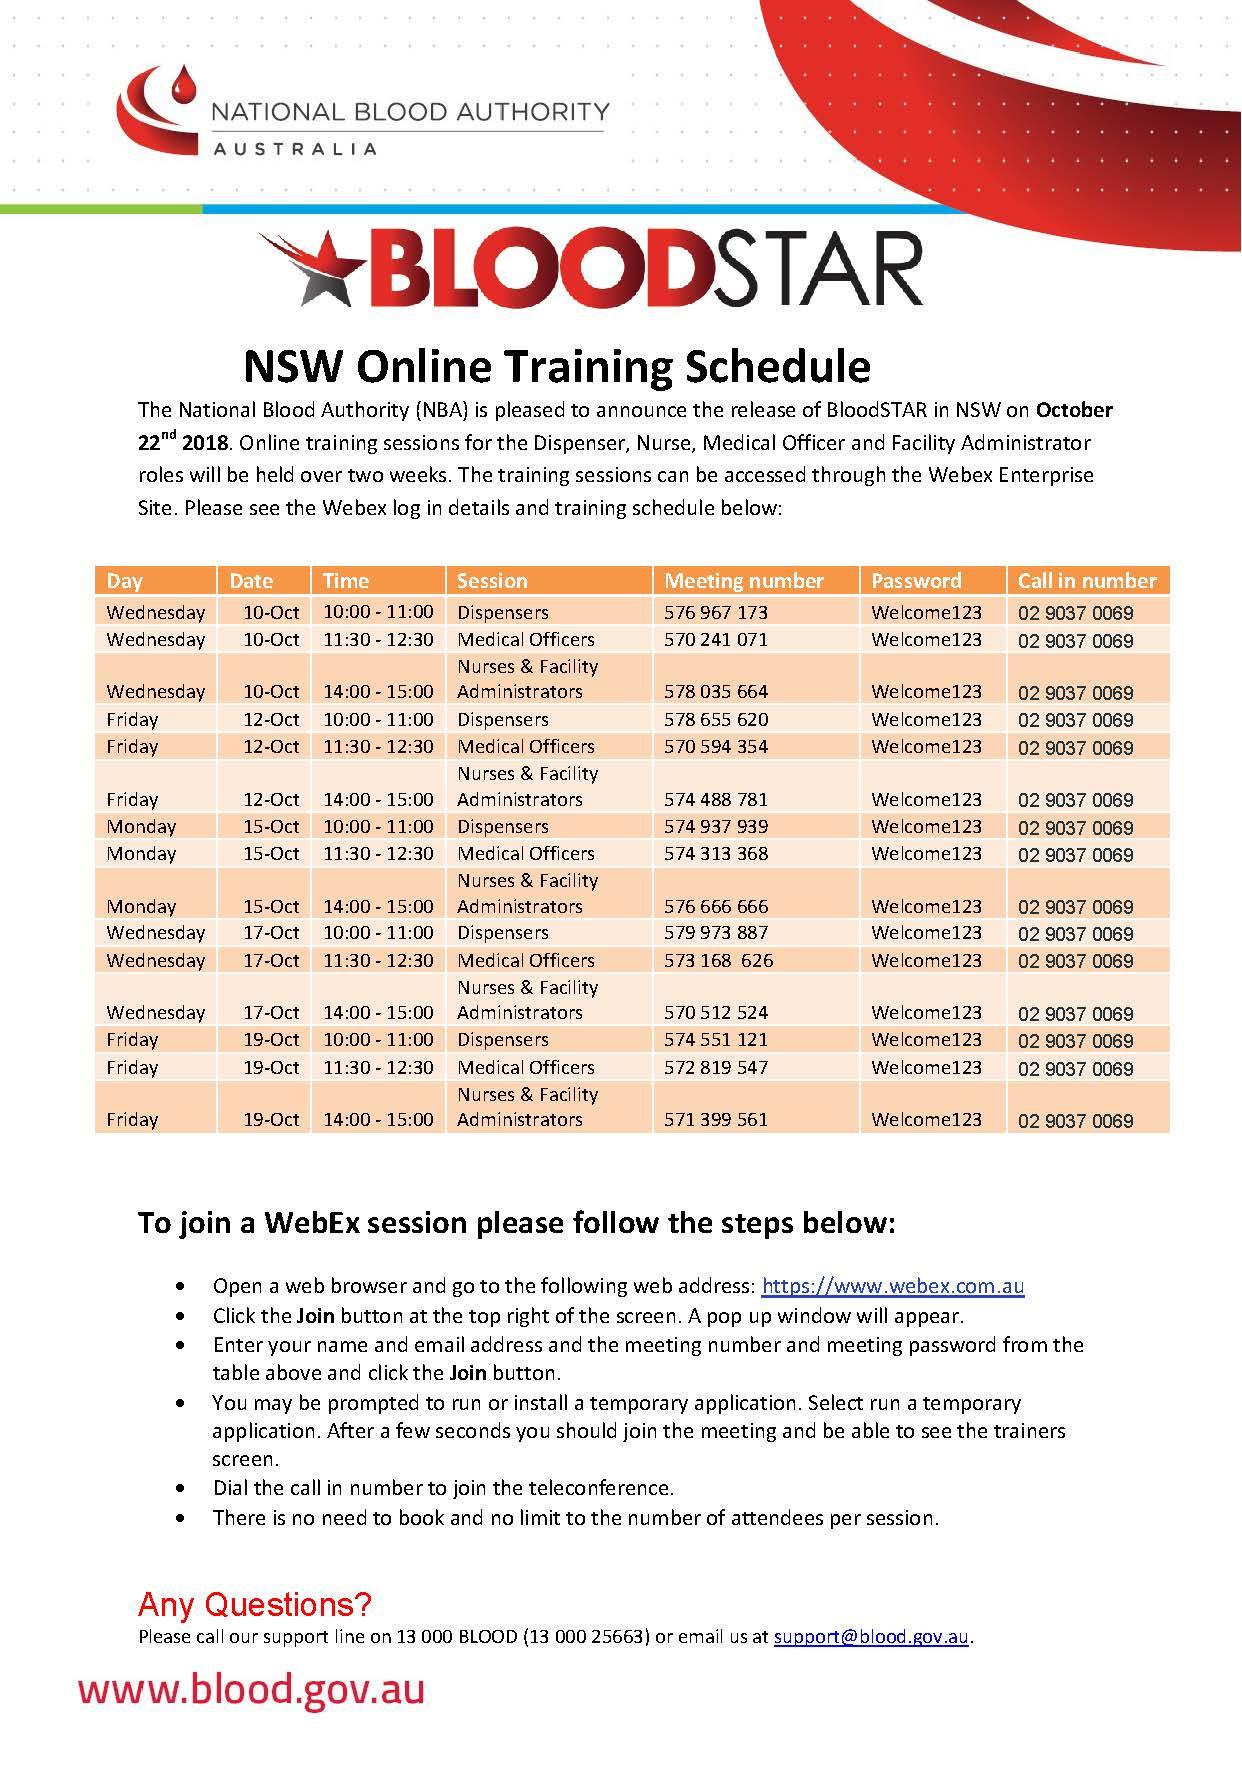 Information about NSW Online Training Schedule